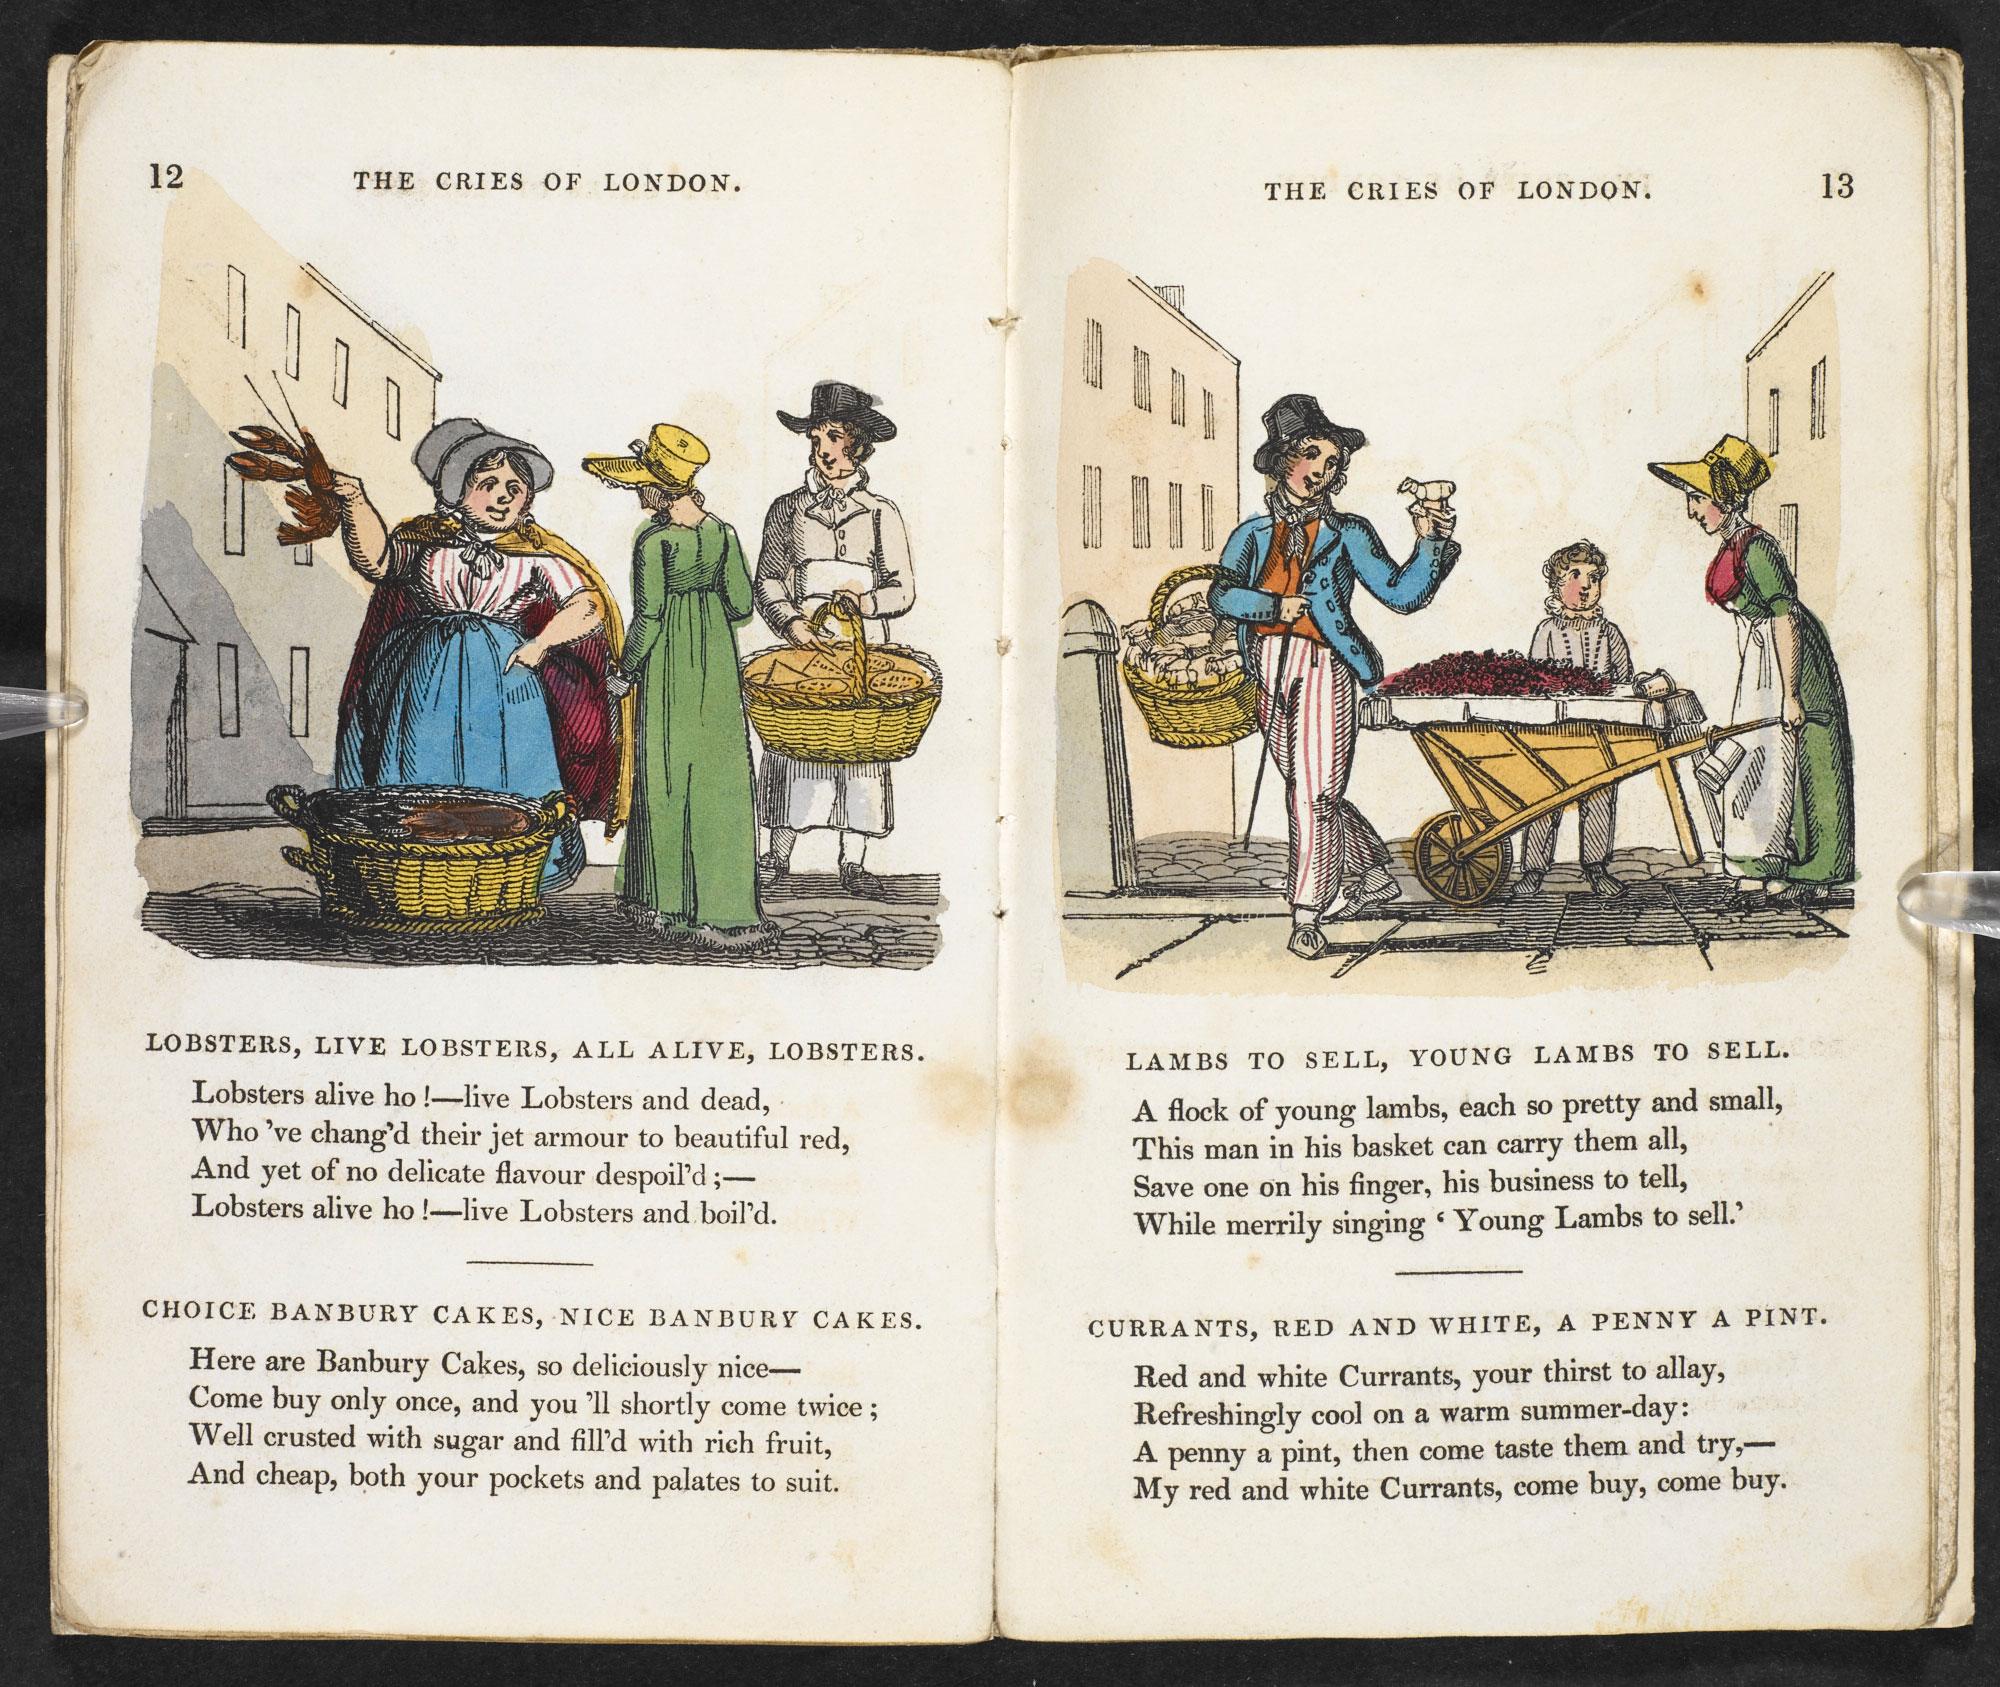 Childrens Book Sam Syntaxs Description Of The Cries London 1821 Usage Terms Public Domain